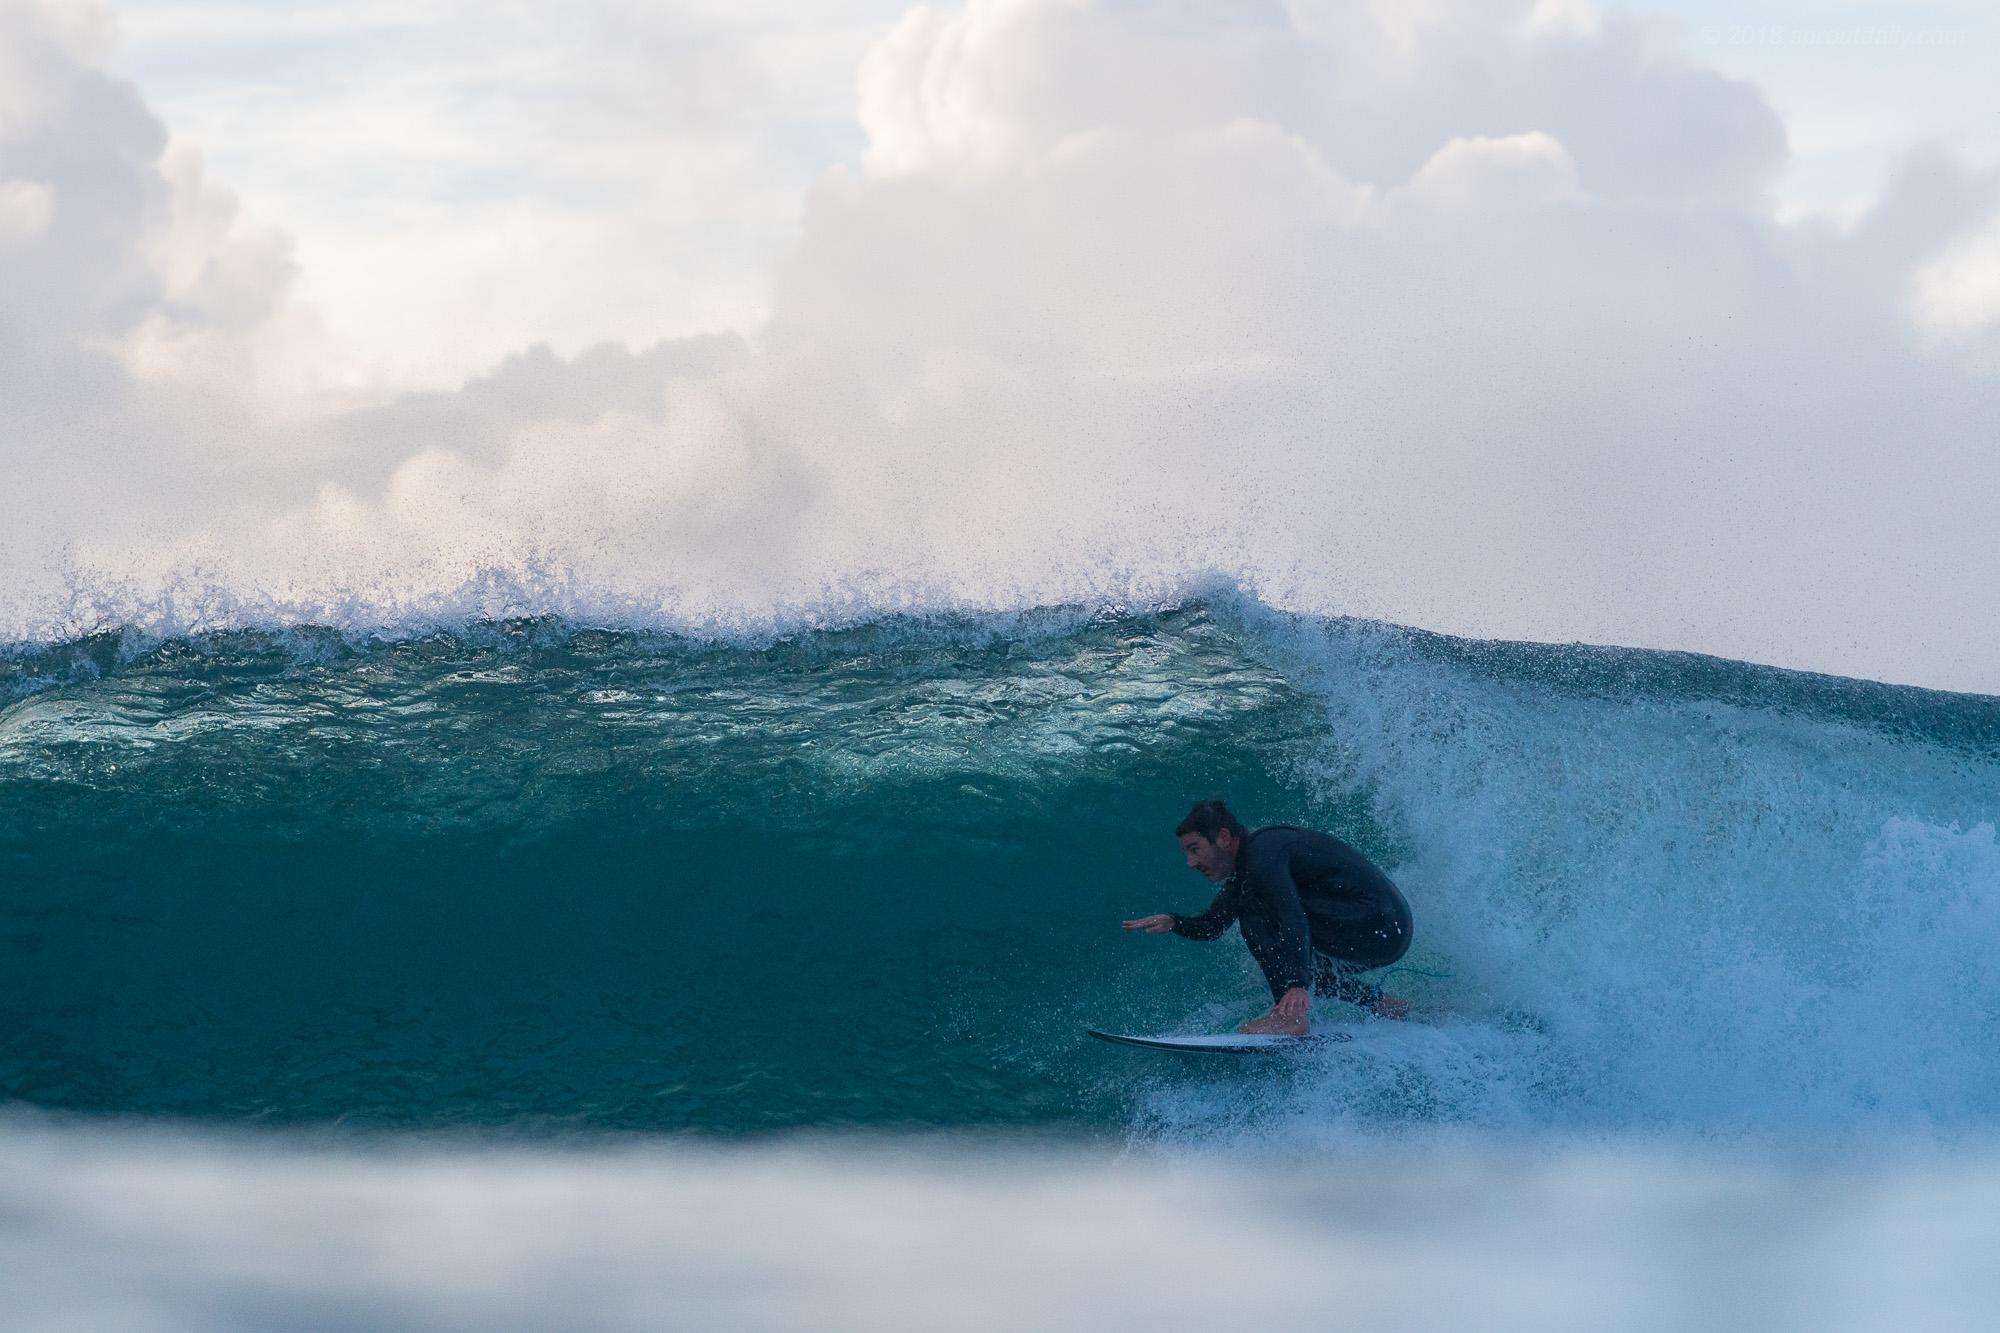 Dave burrowing